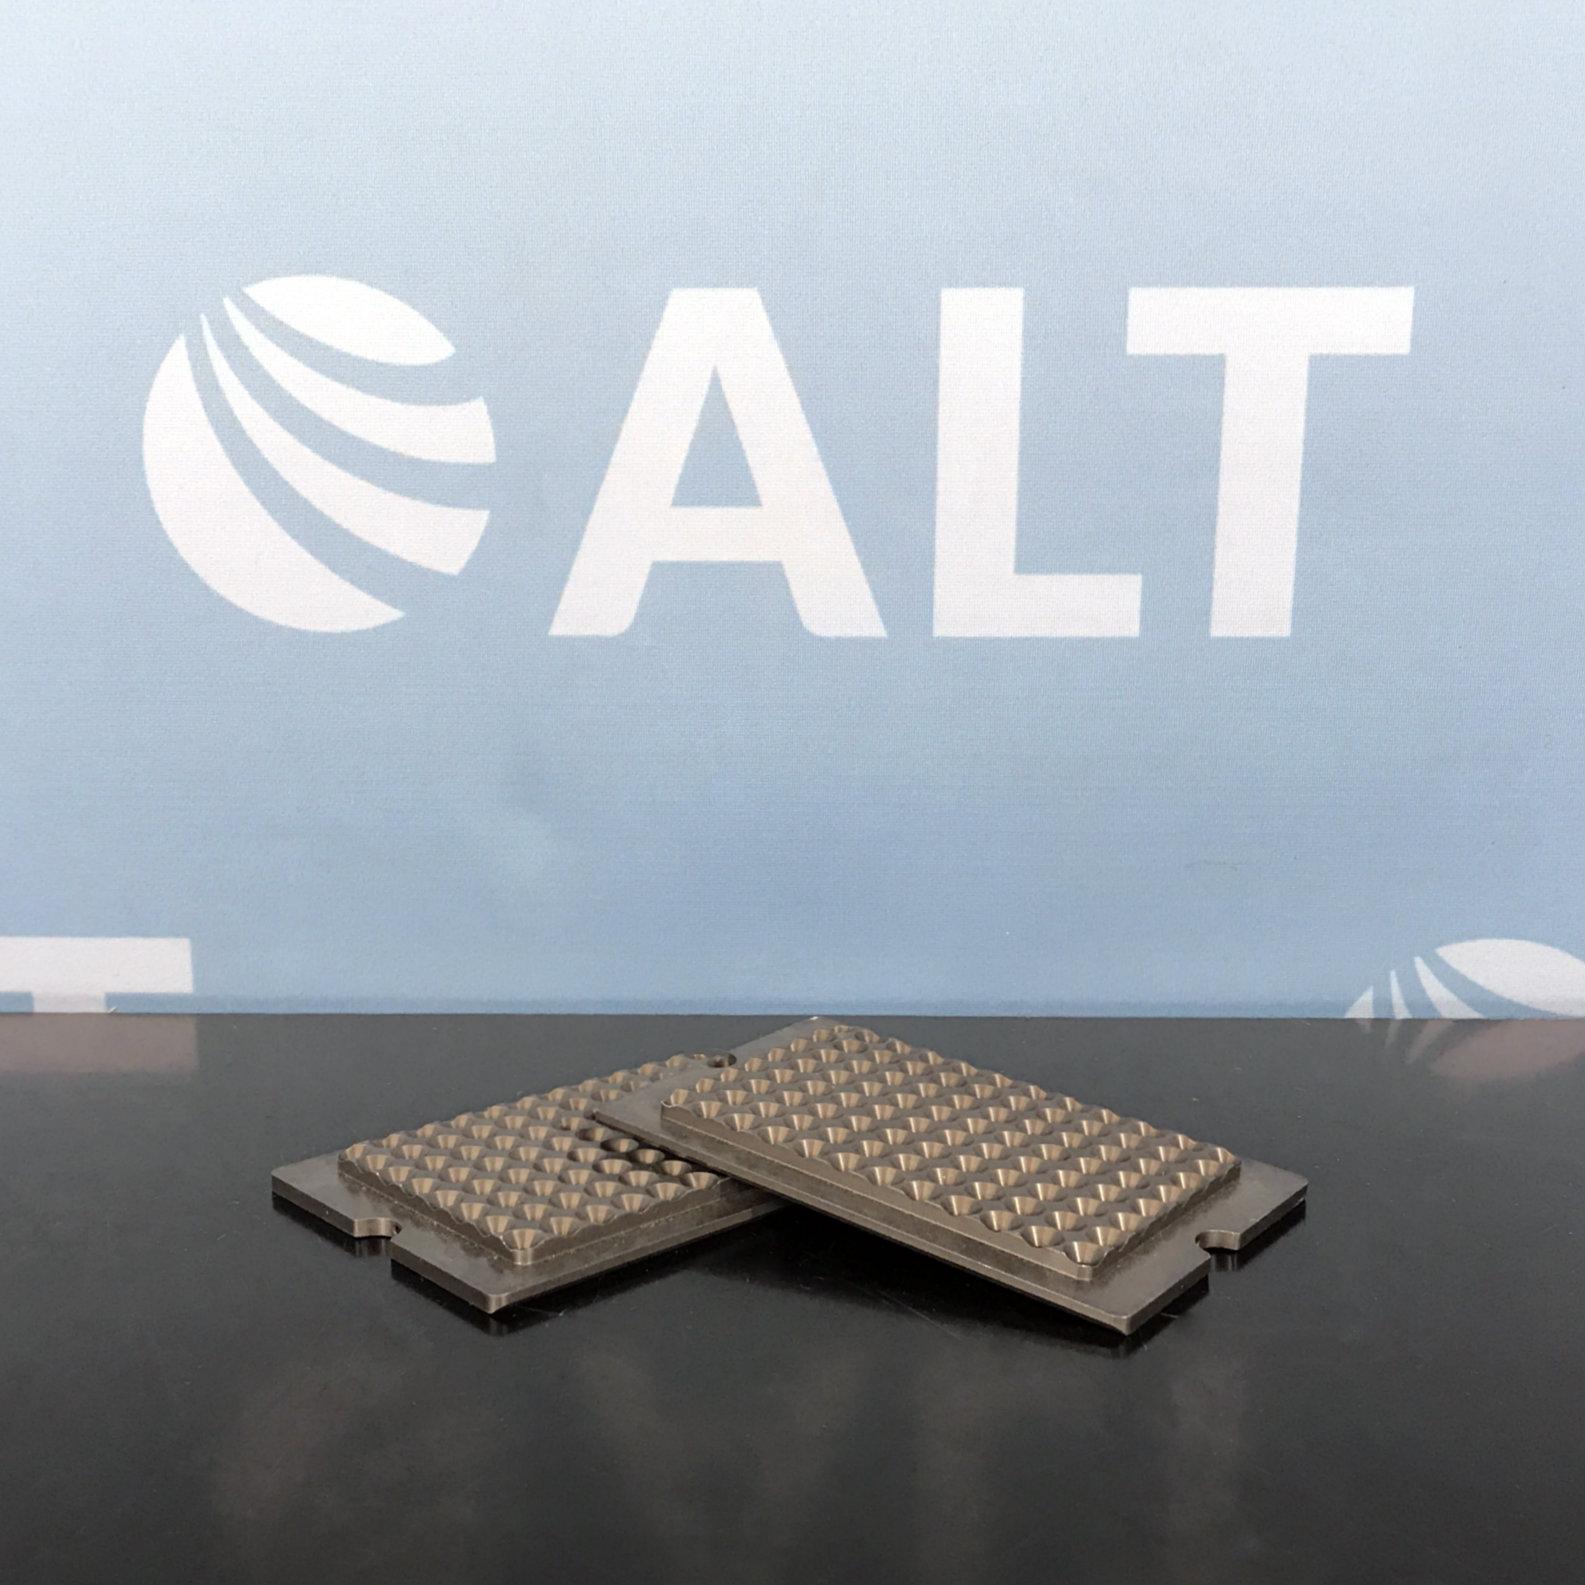 SP Scientific Genevac Microplate Heat Transfer Plate P/N 70-087 (Set of 2) Image